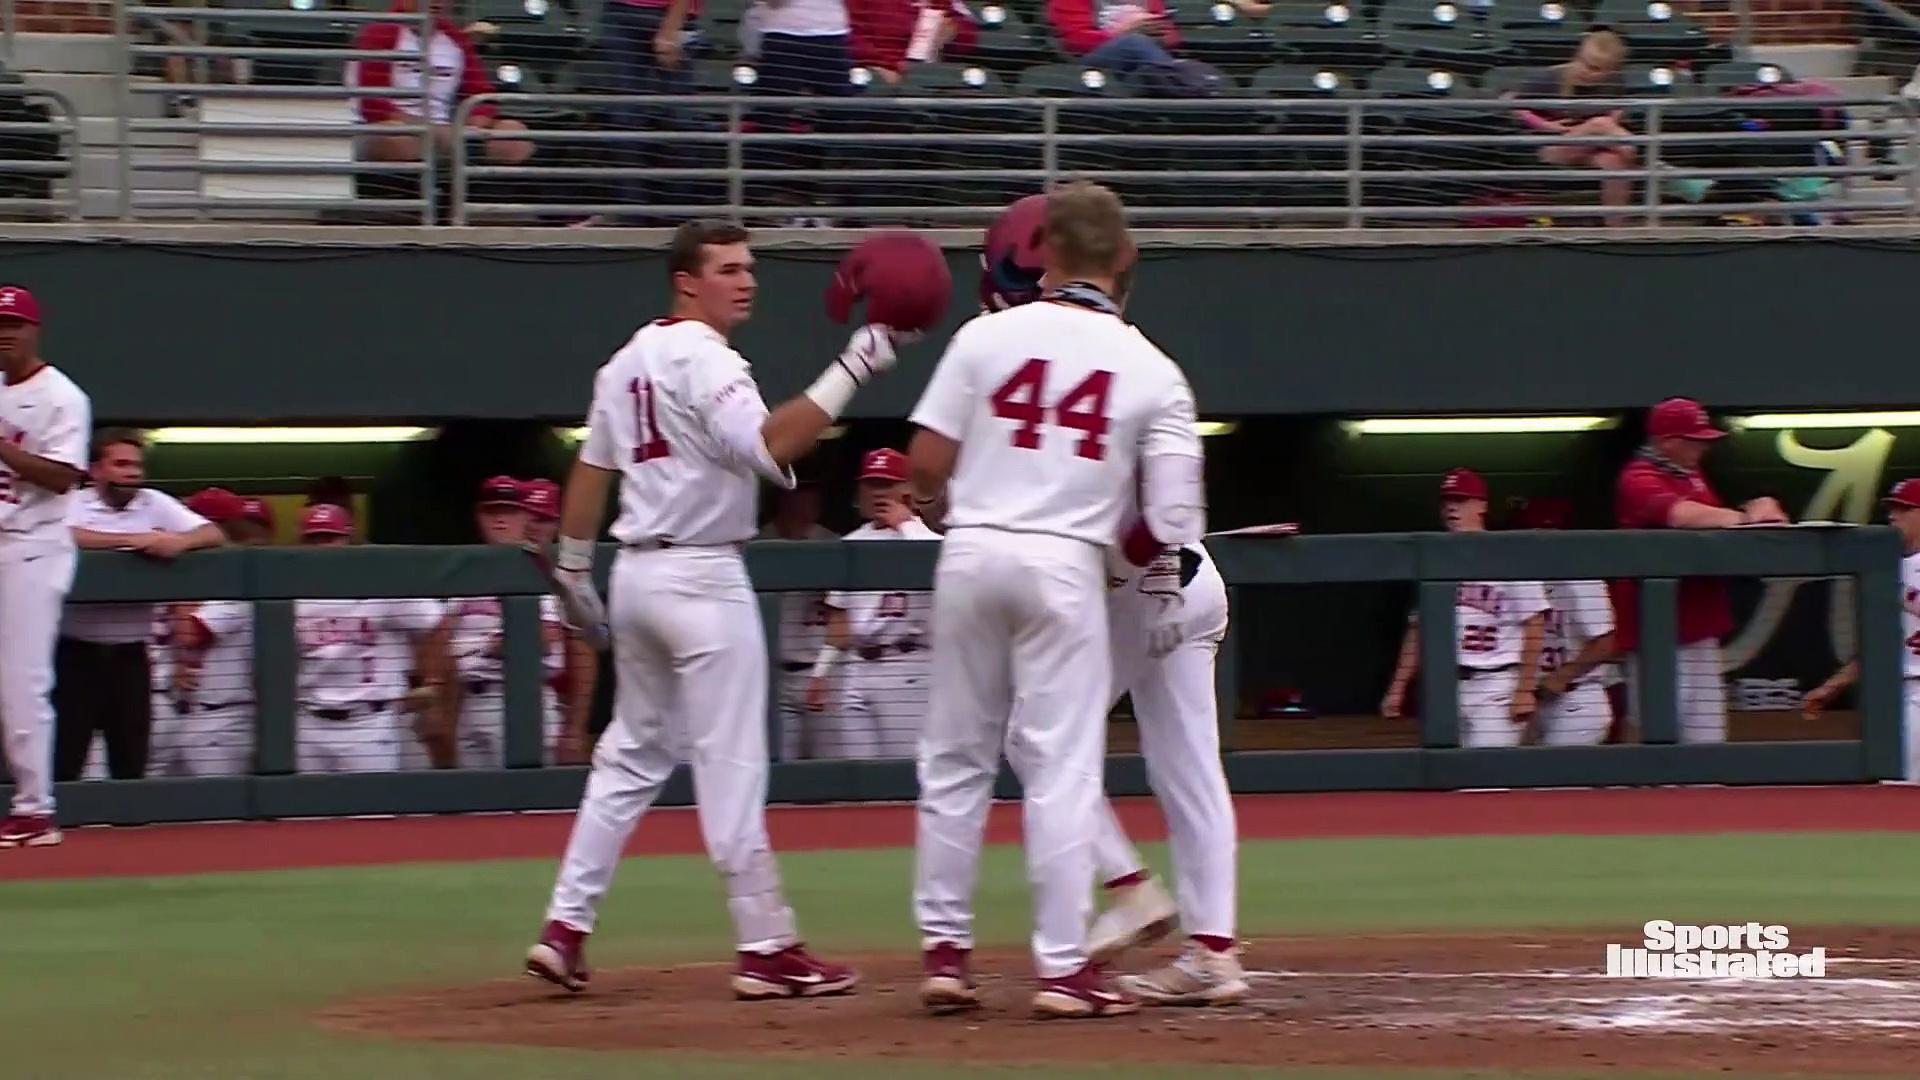 Highlights: Alabama Baseball 11, Missouri 8